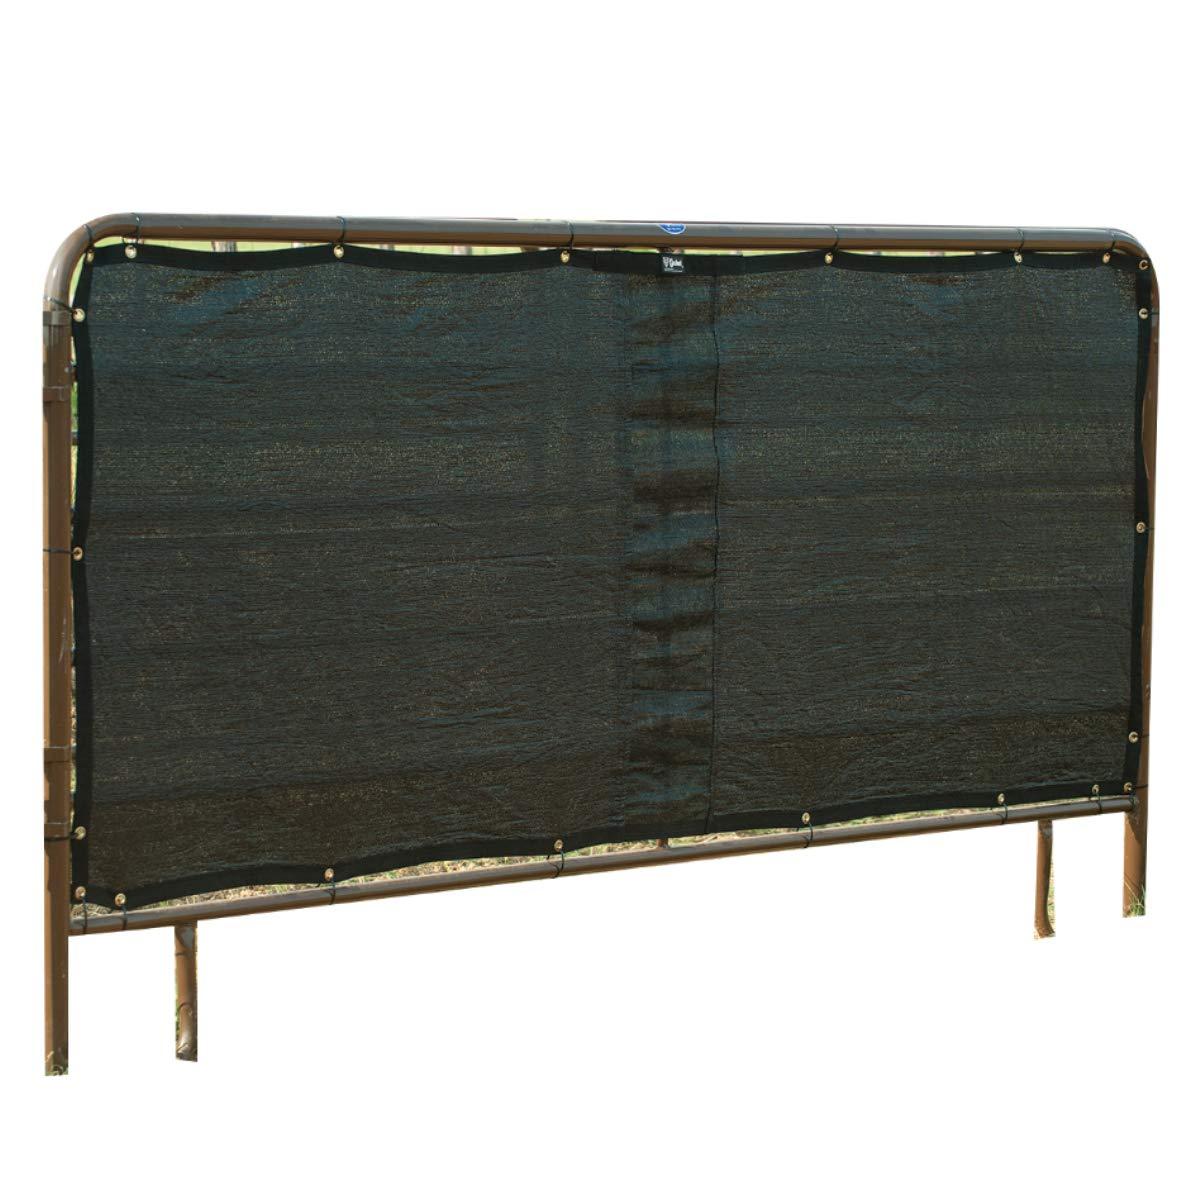 Cashel Stall Panel Screen, 10' by Cashel